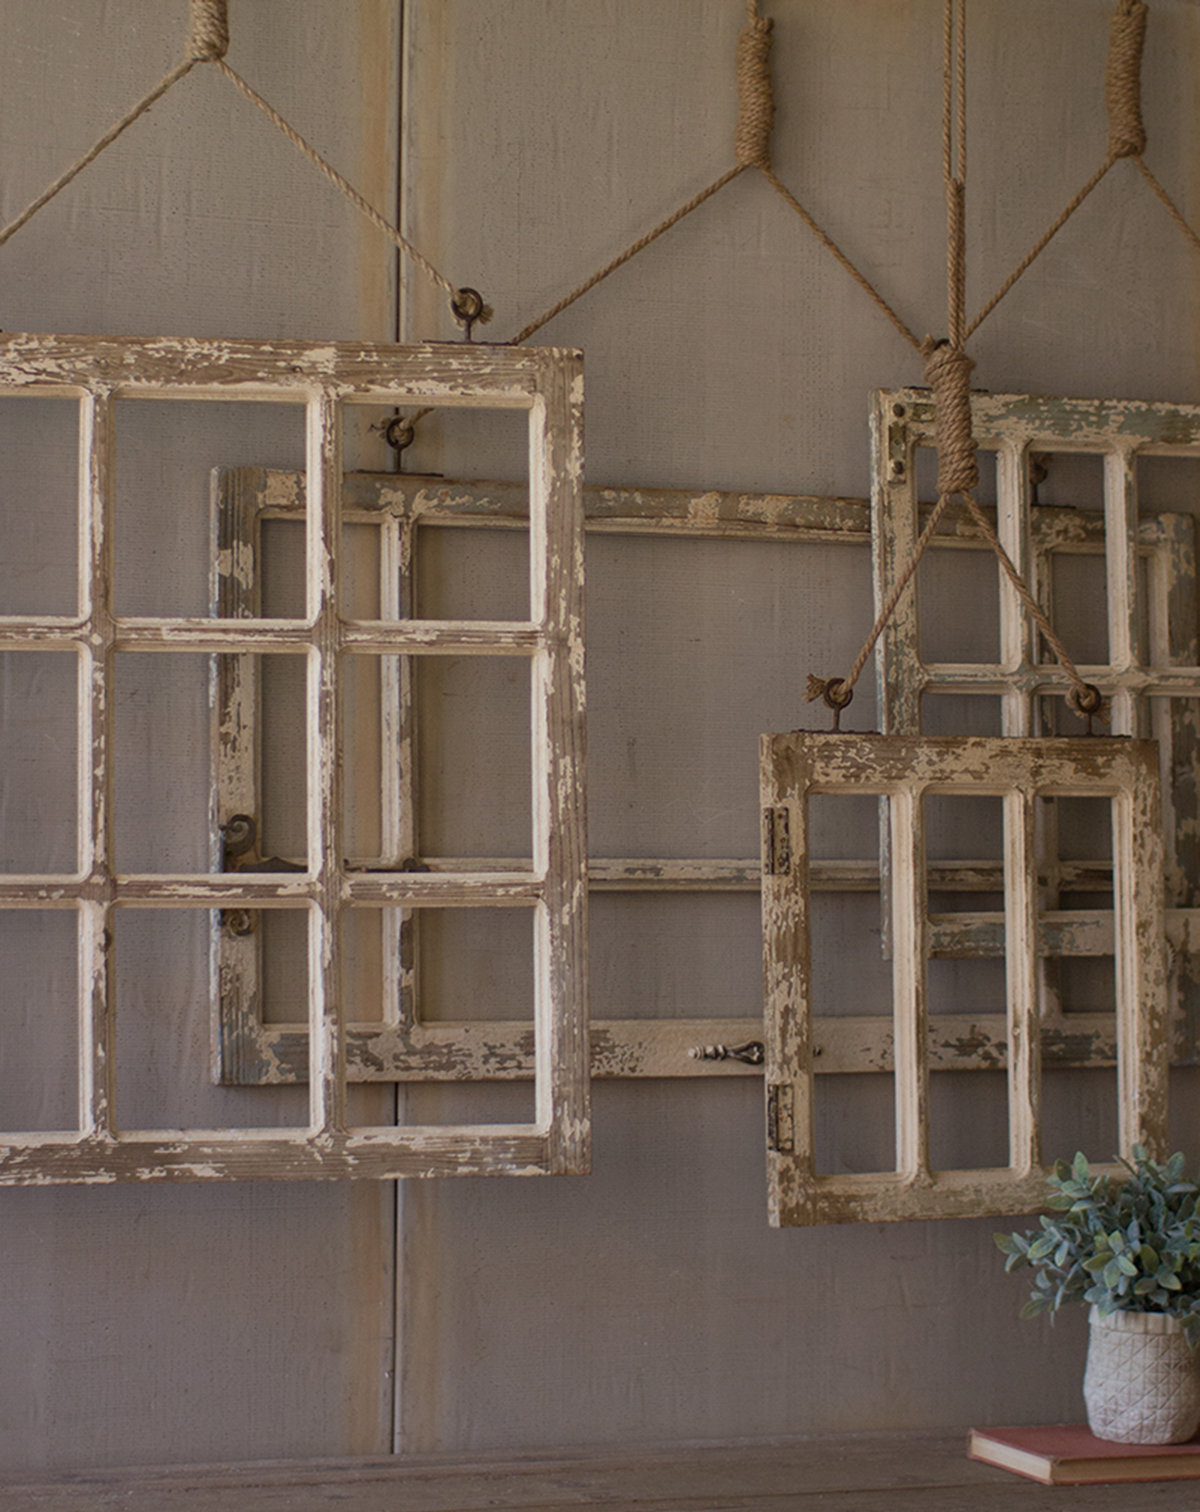 Rustic Window Frame Wall Decor   Wayfair For Old Rustic Barn Window Frame (Gallery 10 of 30)